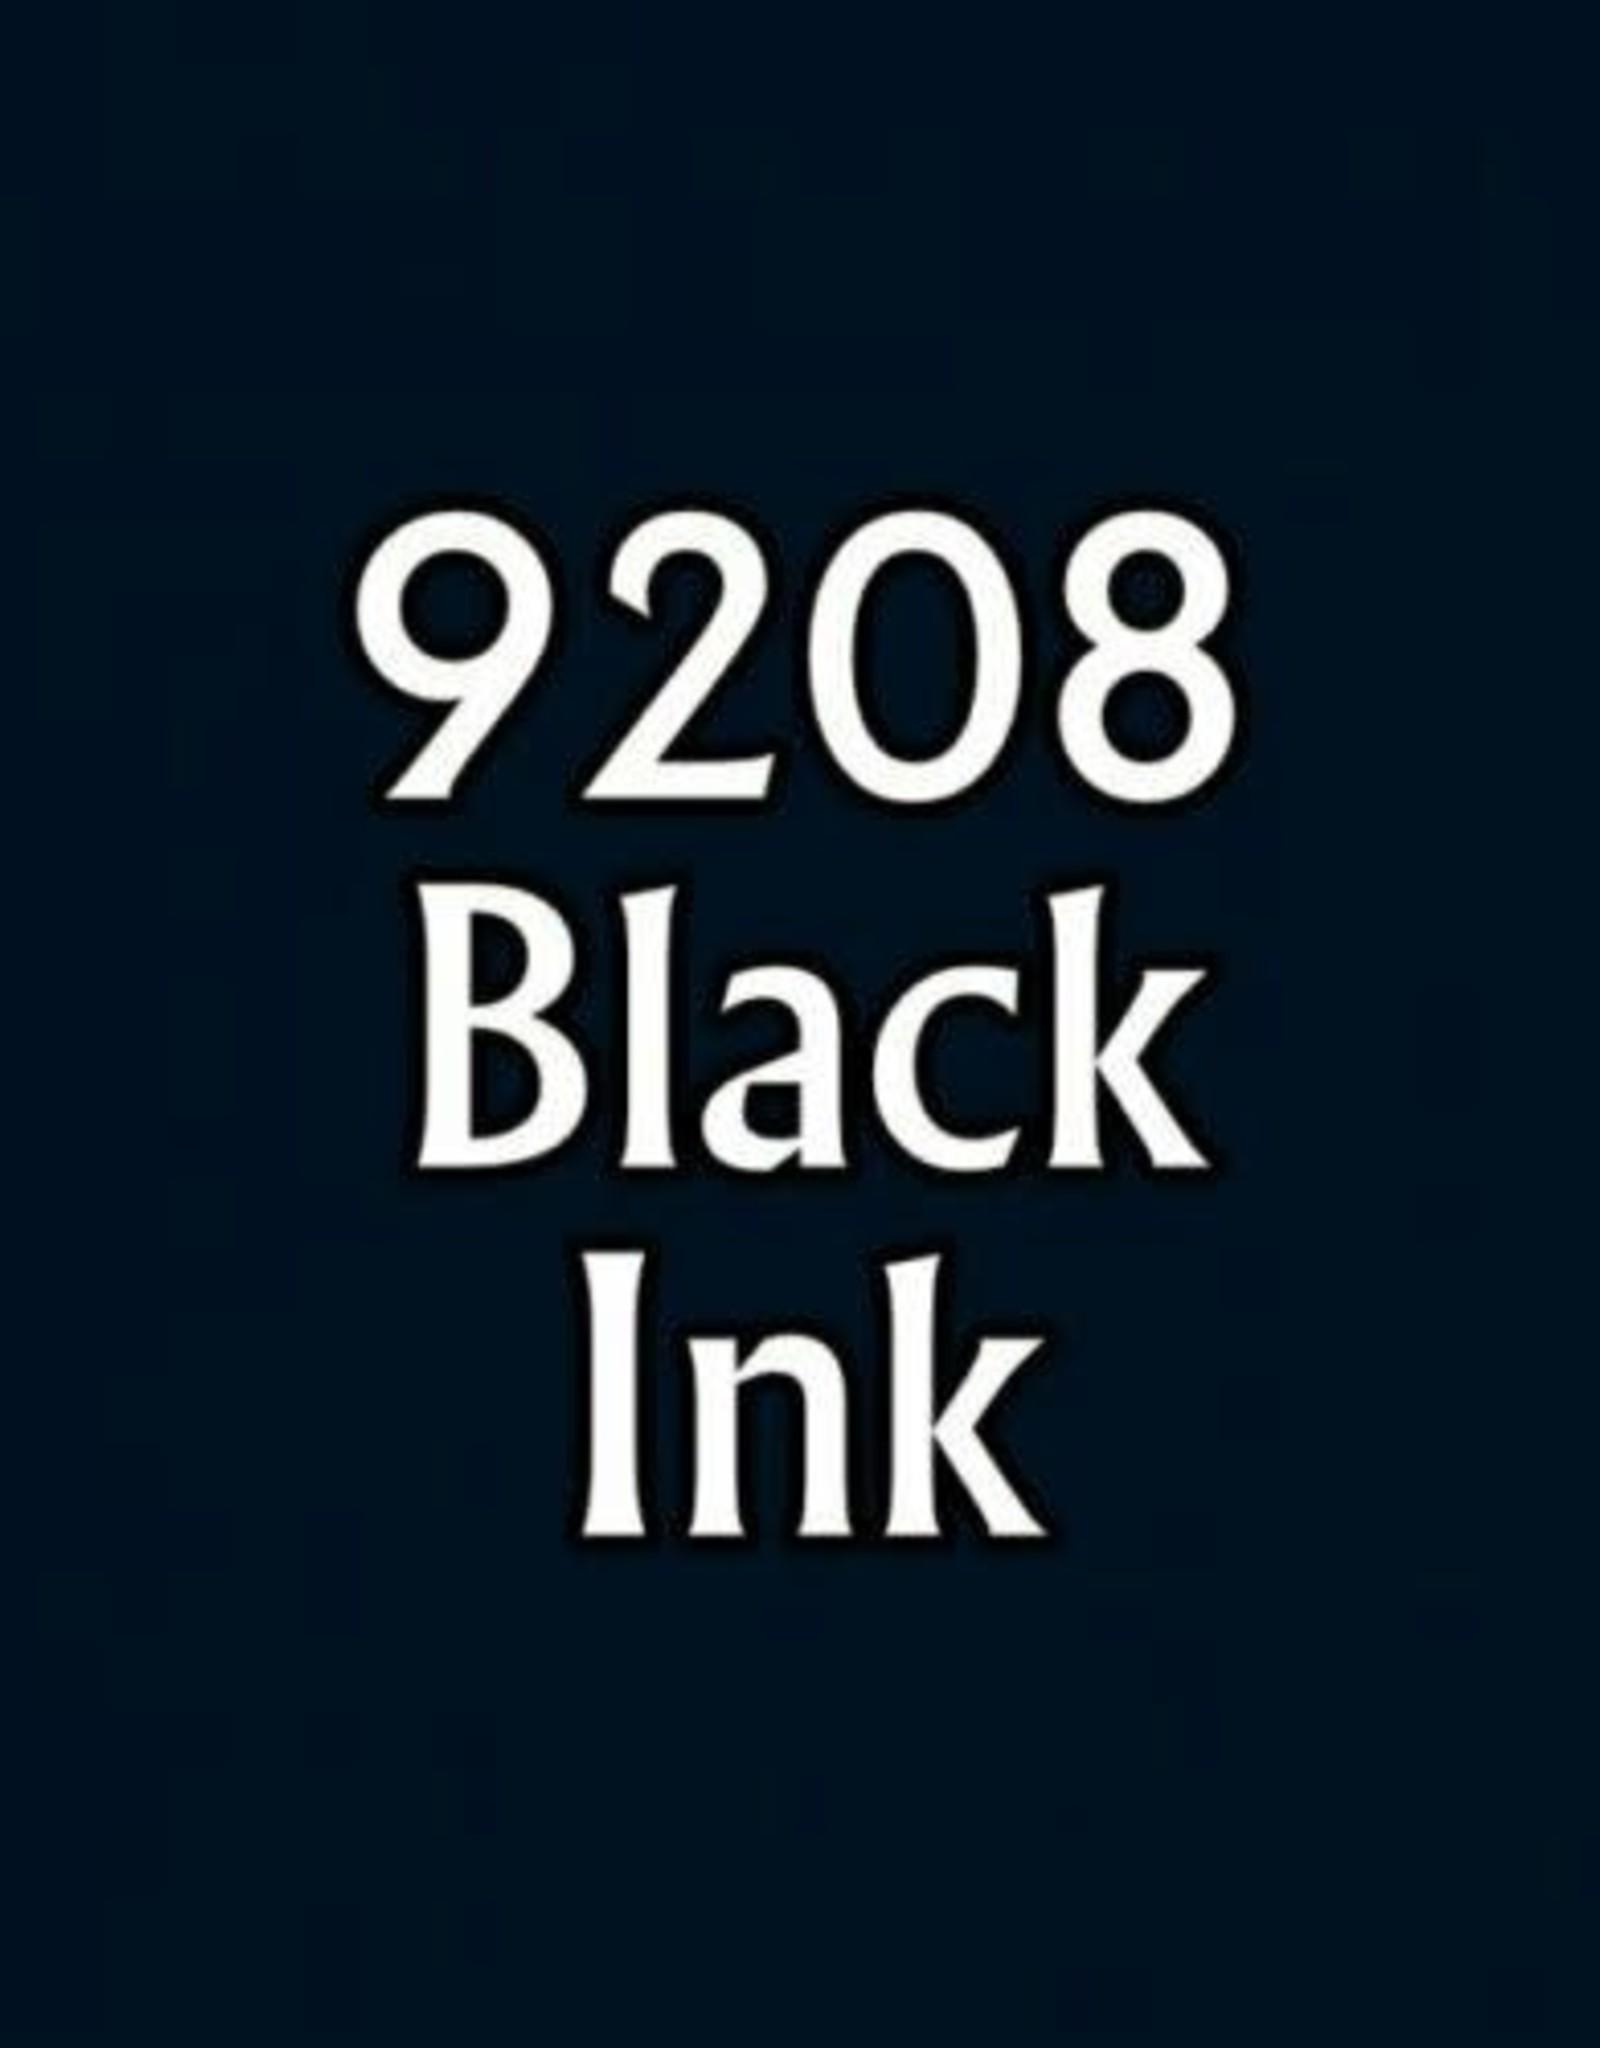 Reaper Black Ink